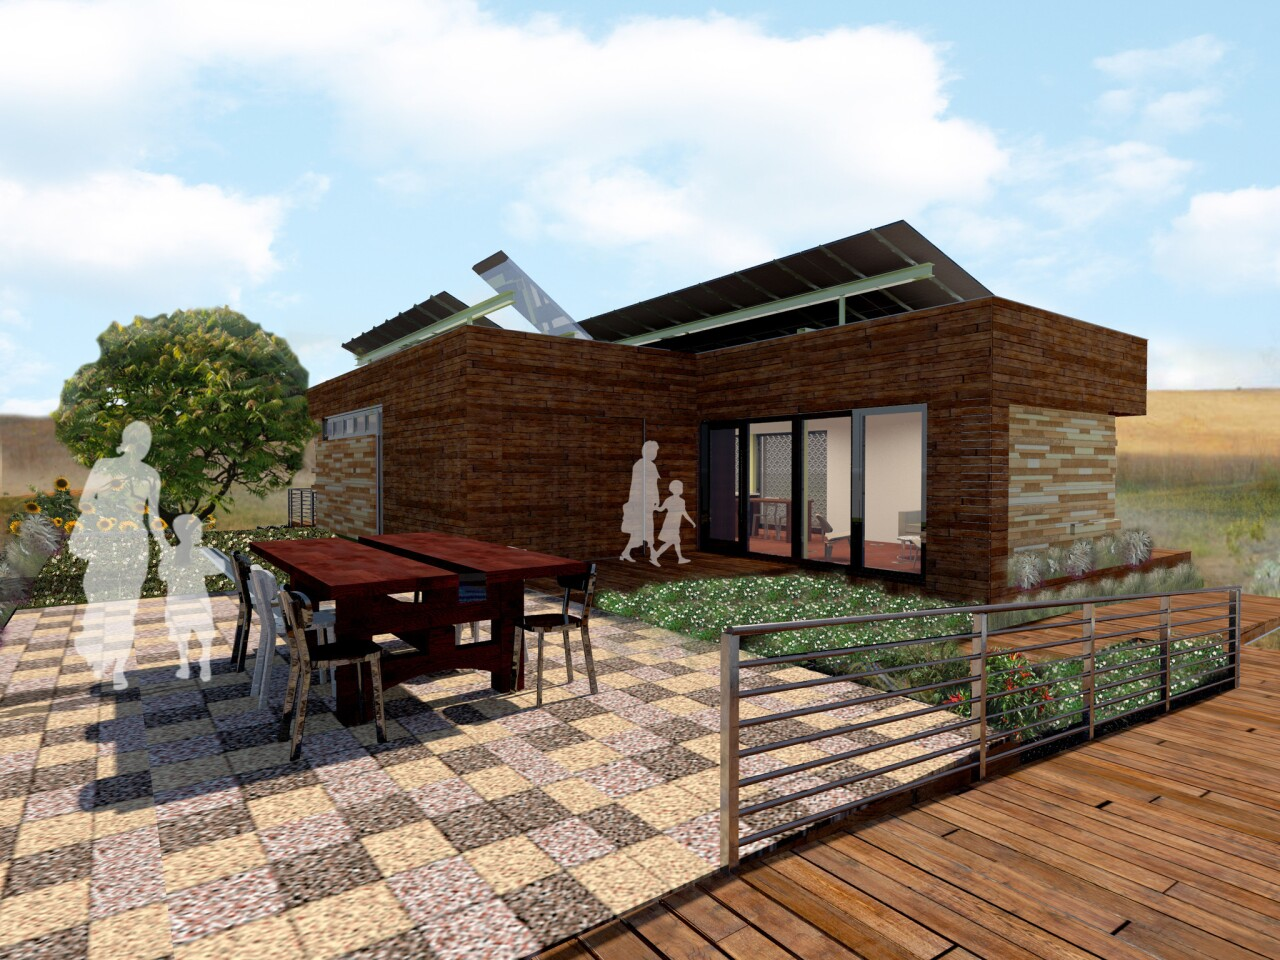 Team Capitol DC: Harvest Home artist renderings